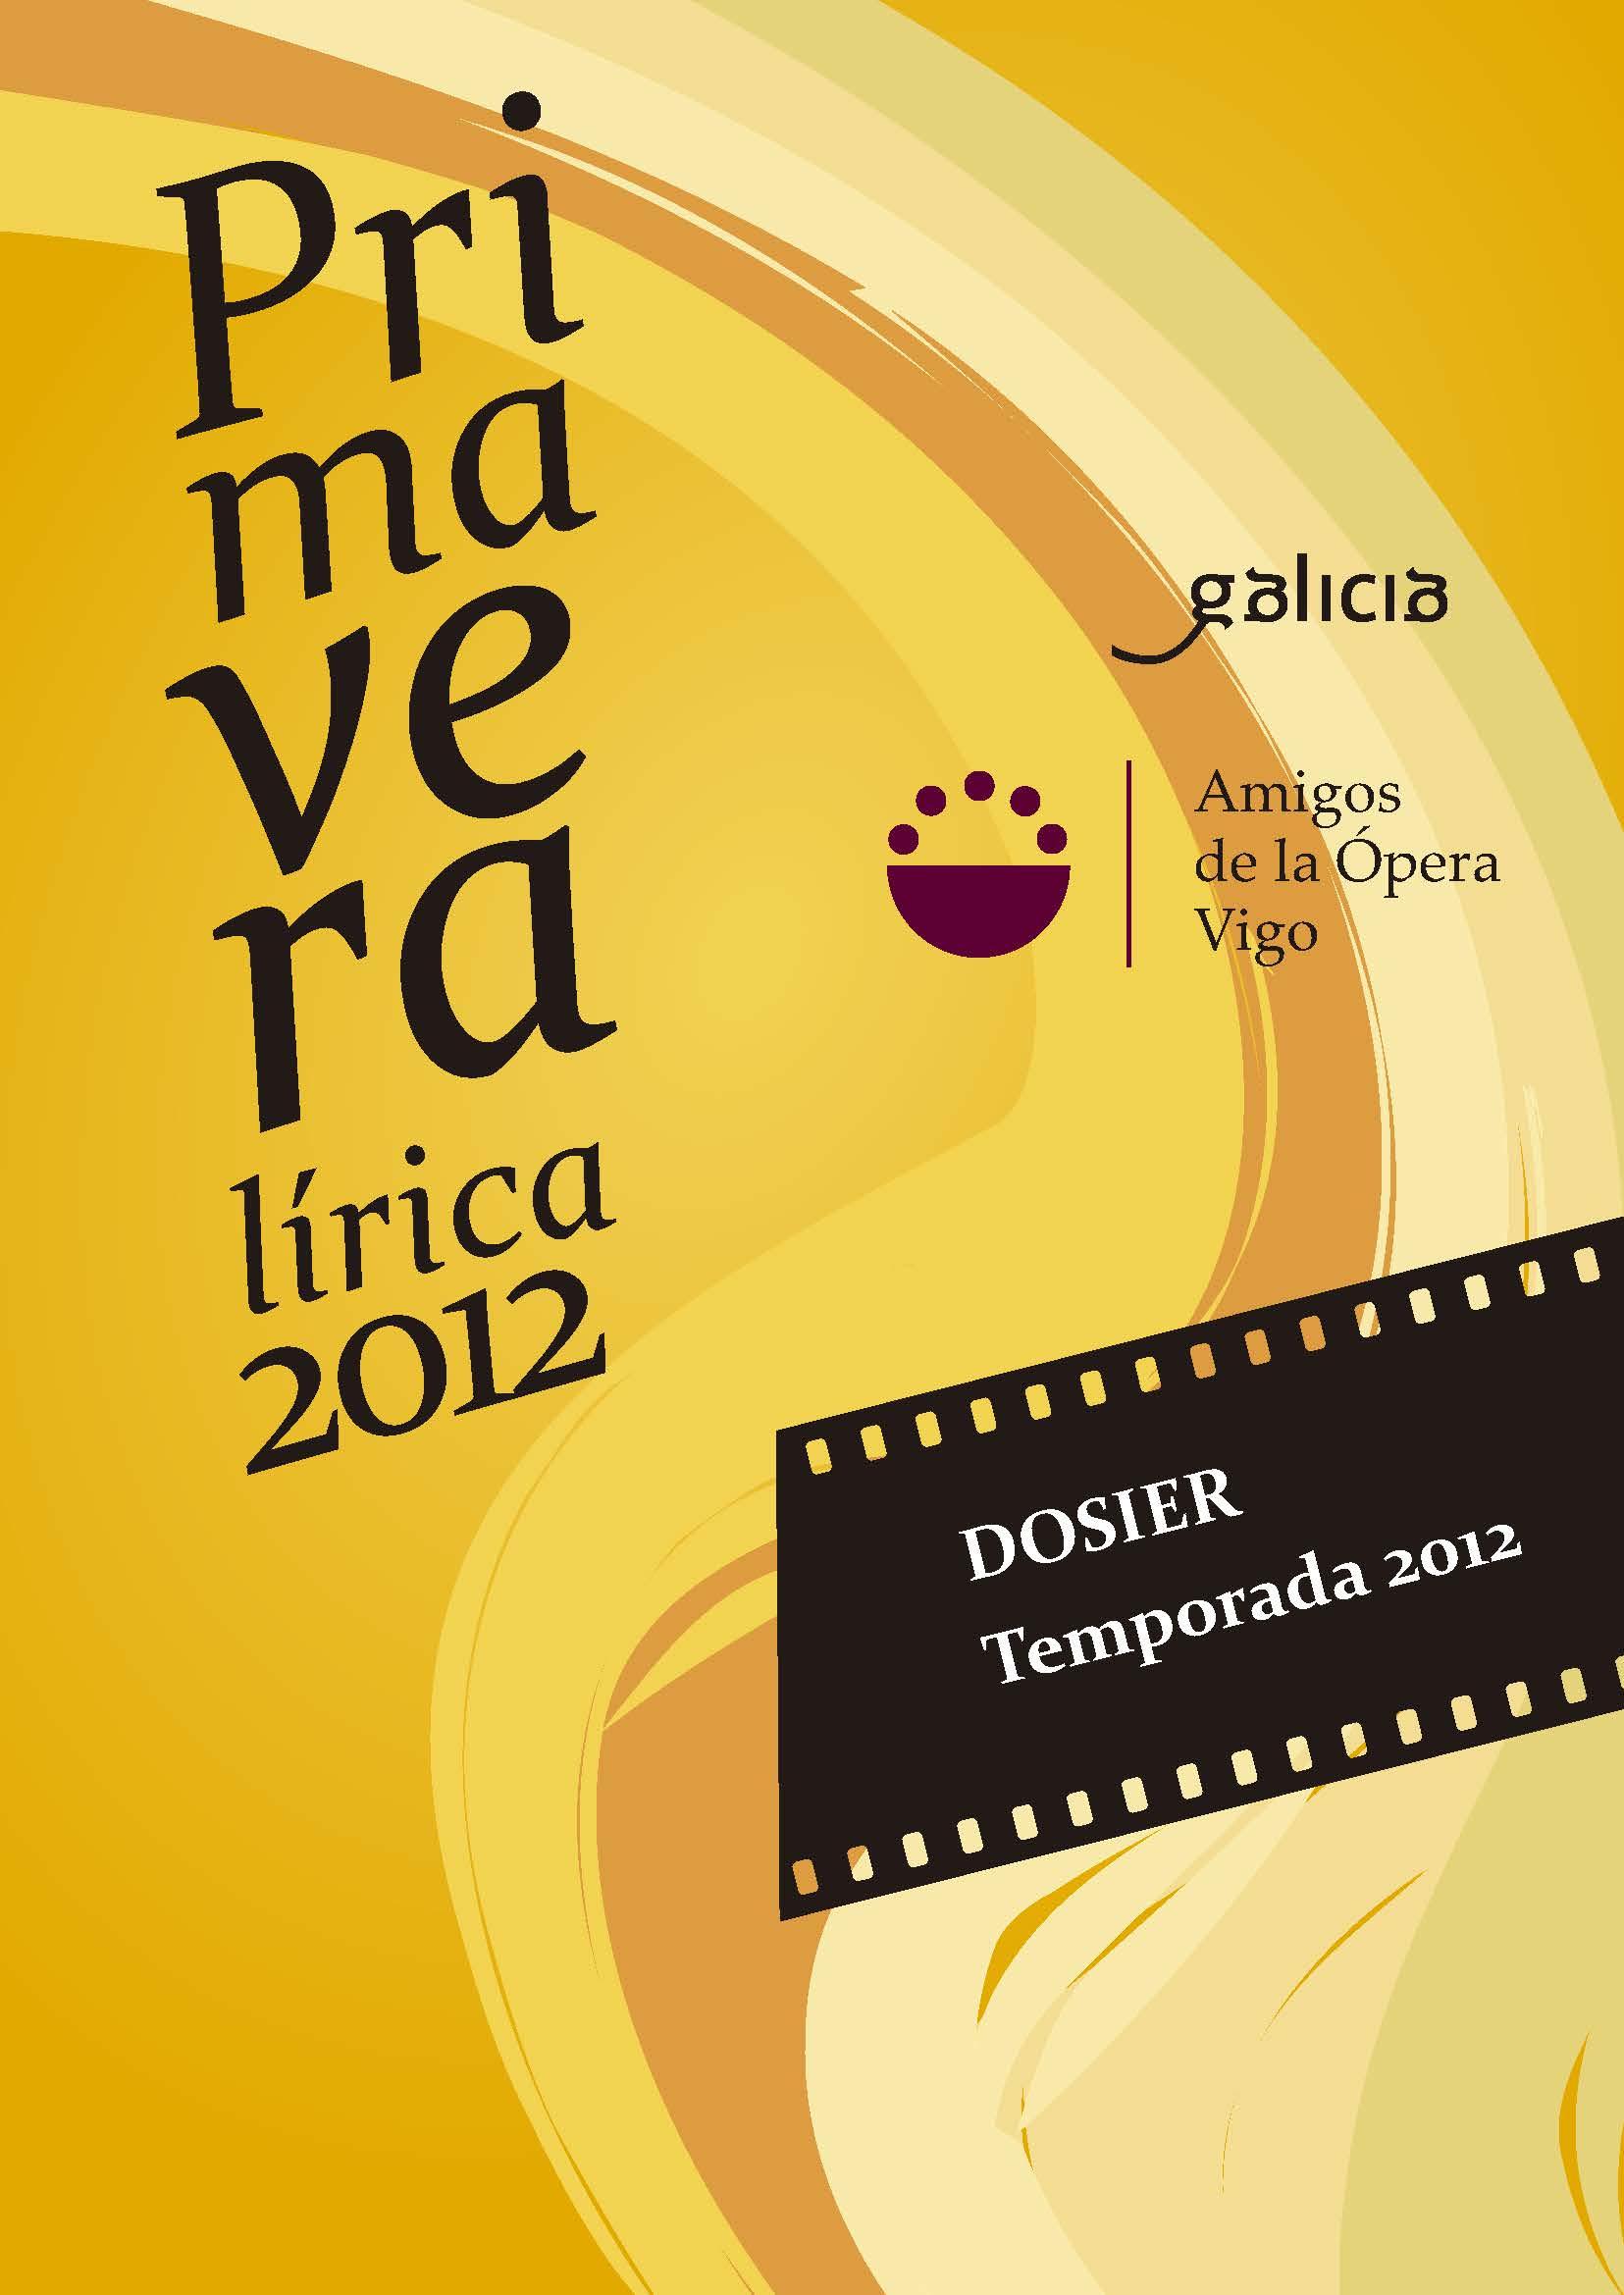 Dosier Prensa 2012